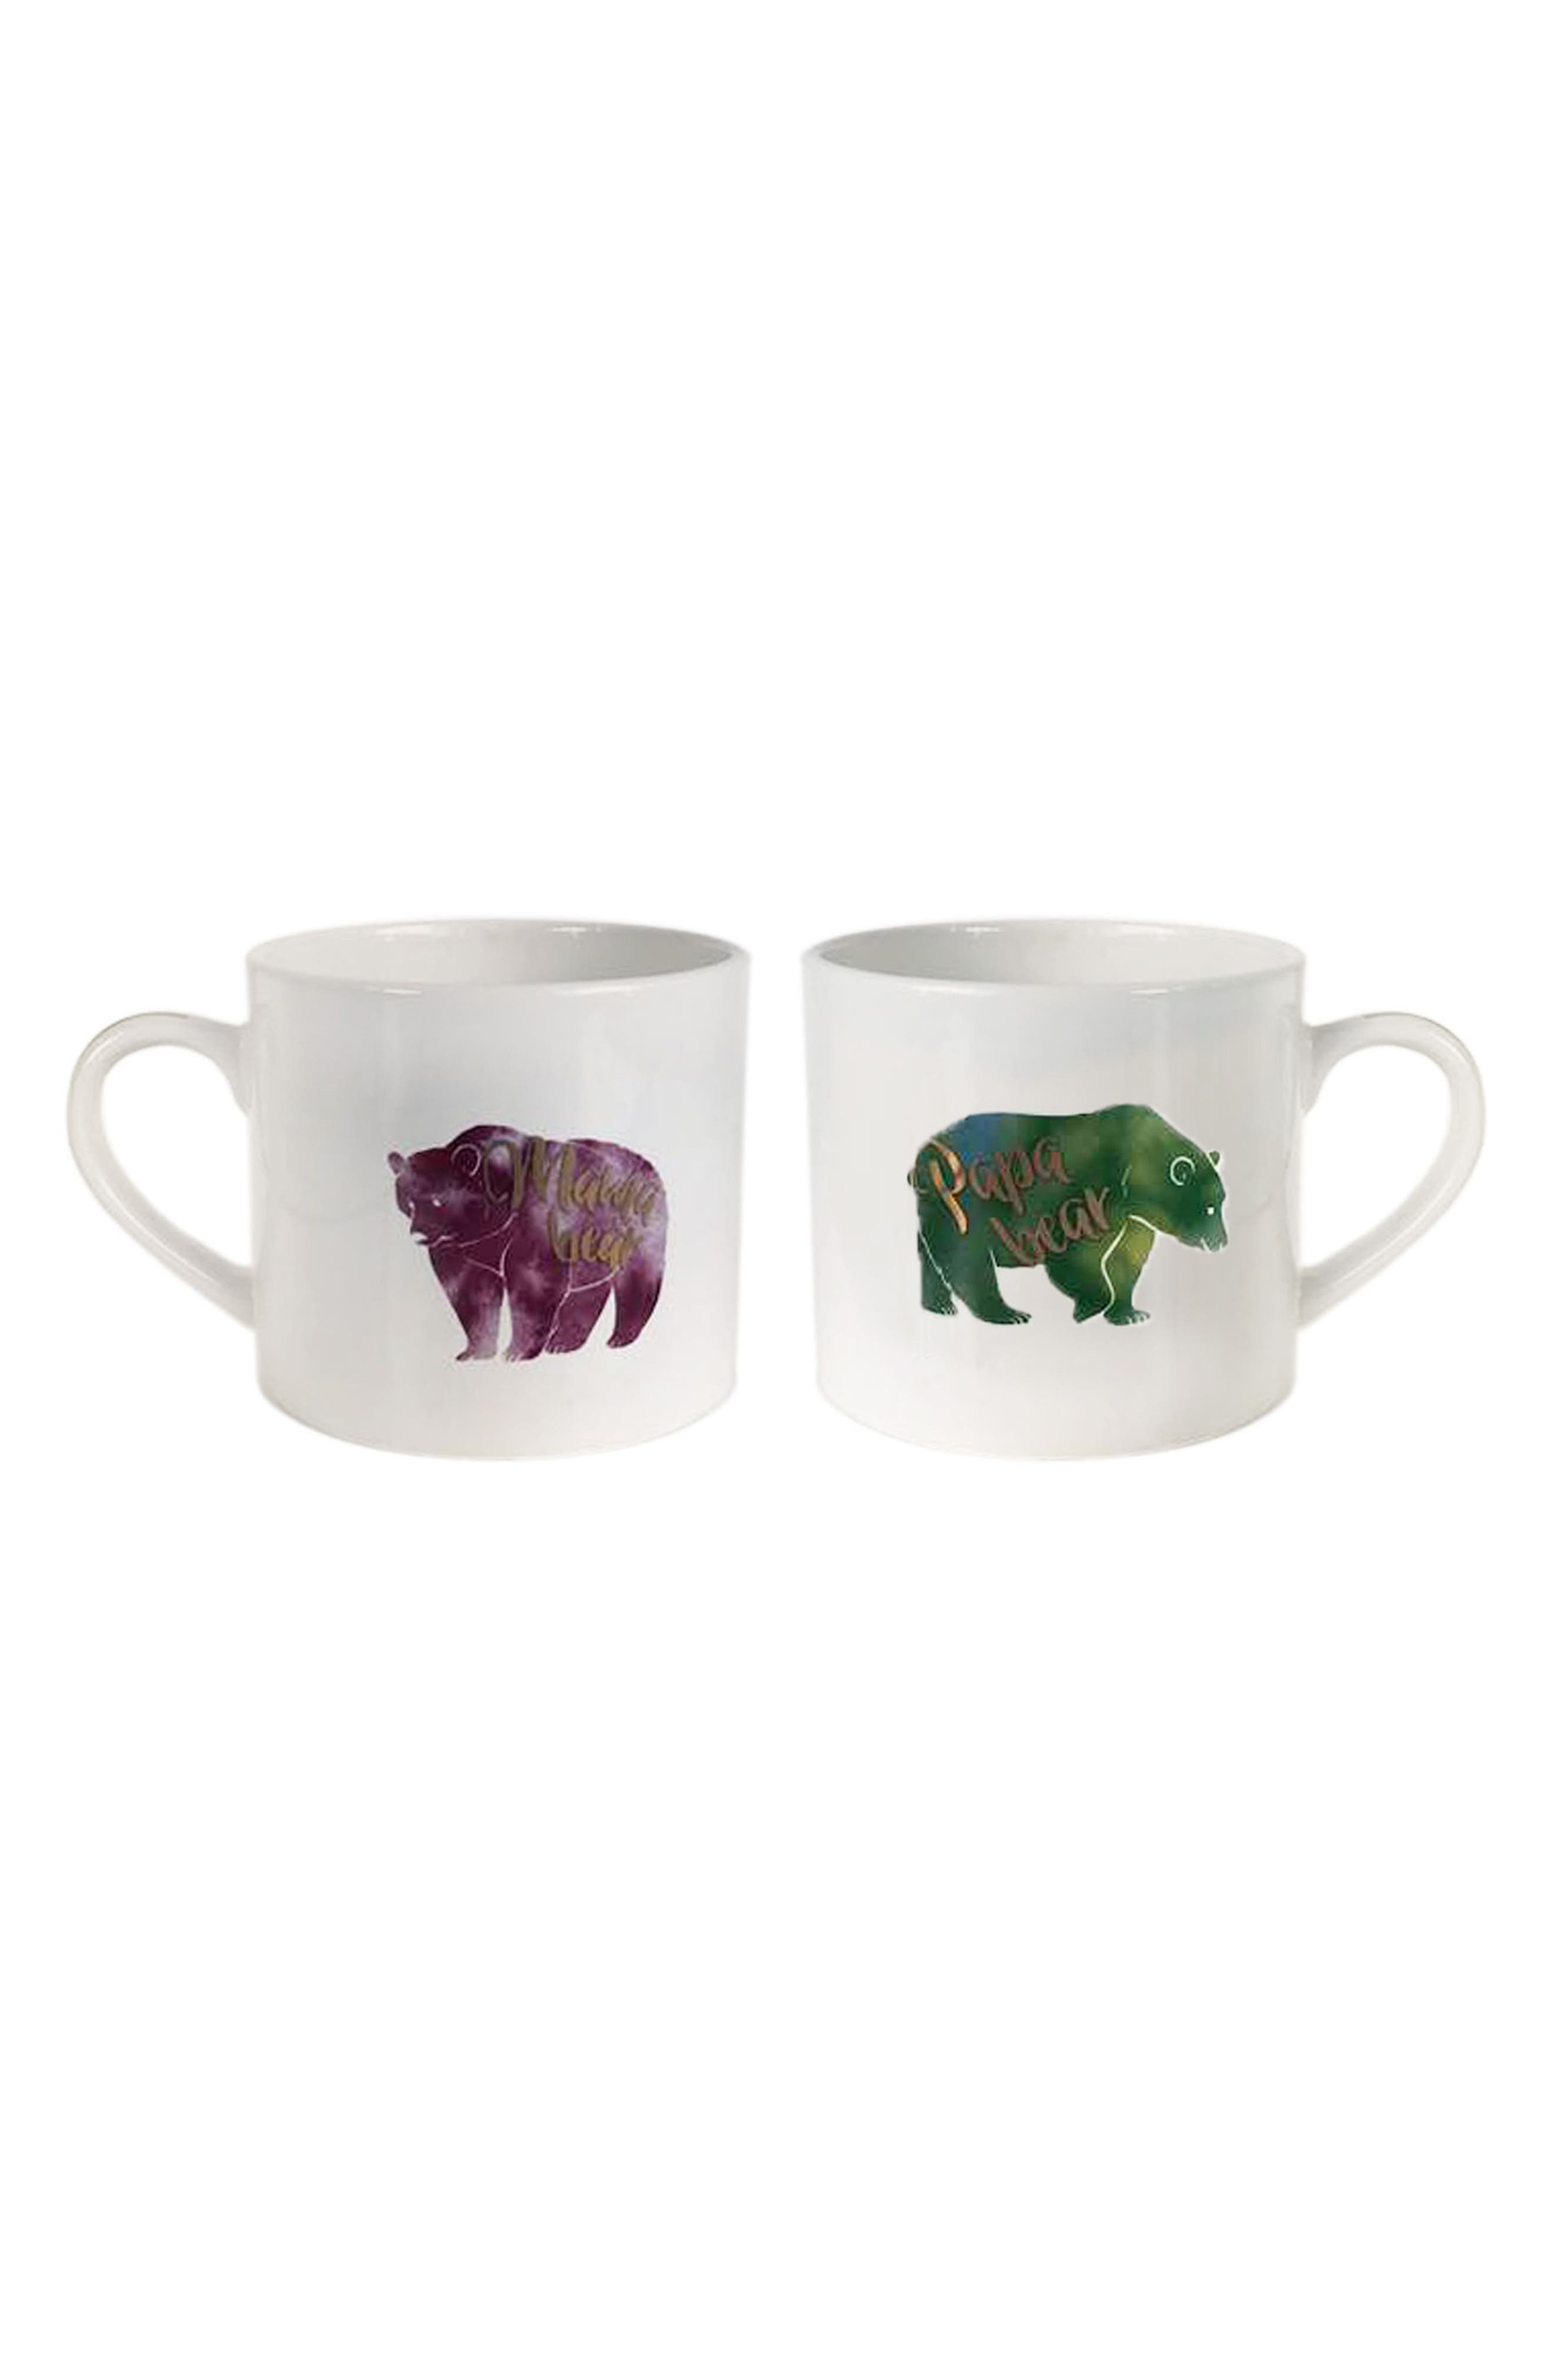 Papa Bear & Mama Bear Set of 2 Mugs,                         Main,                         color, White